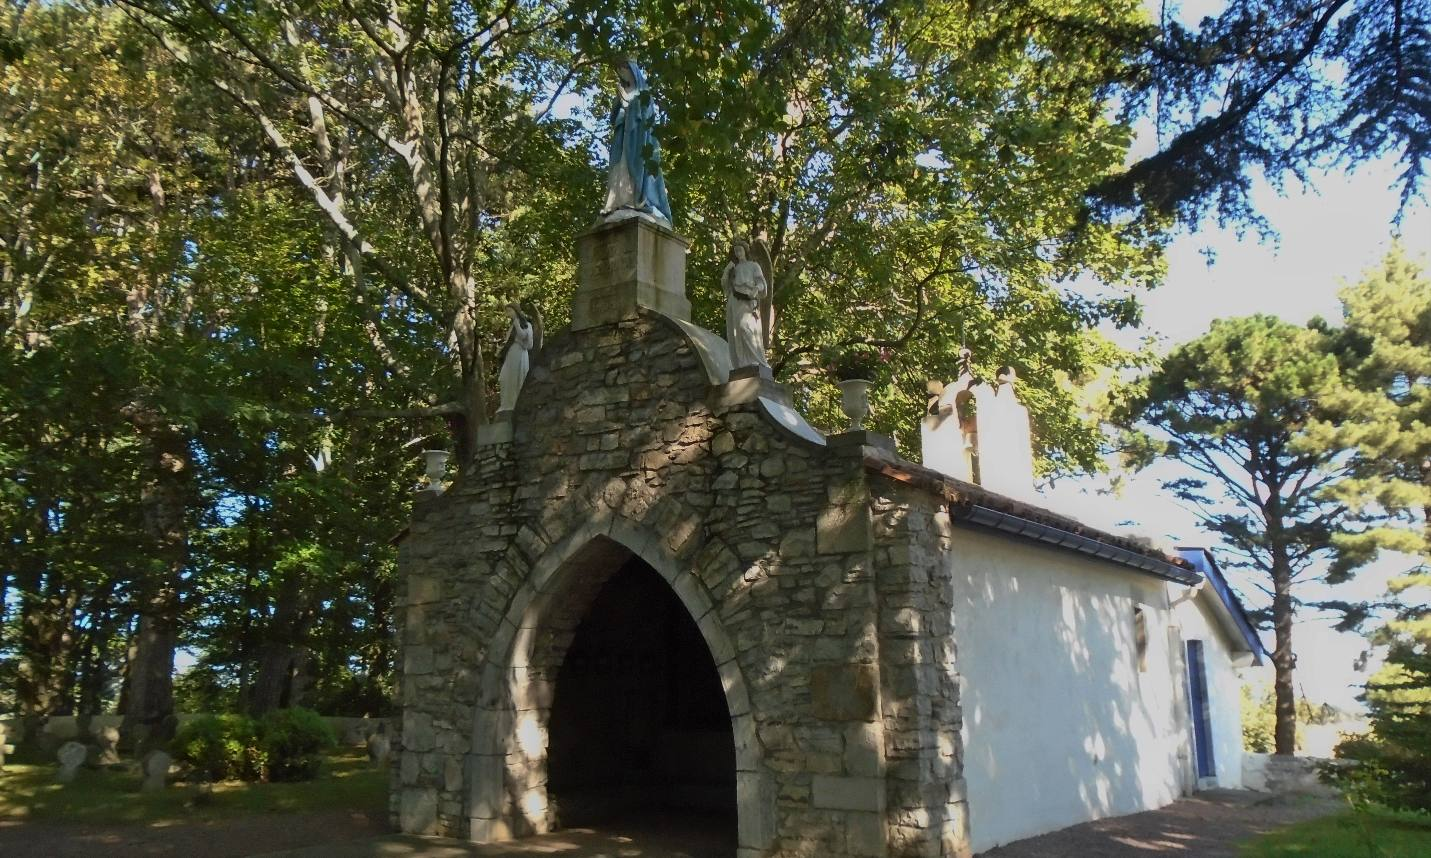 Chapelle Notre Dame de Socori - Urrugne